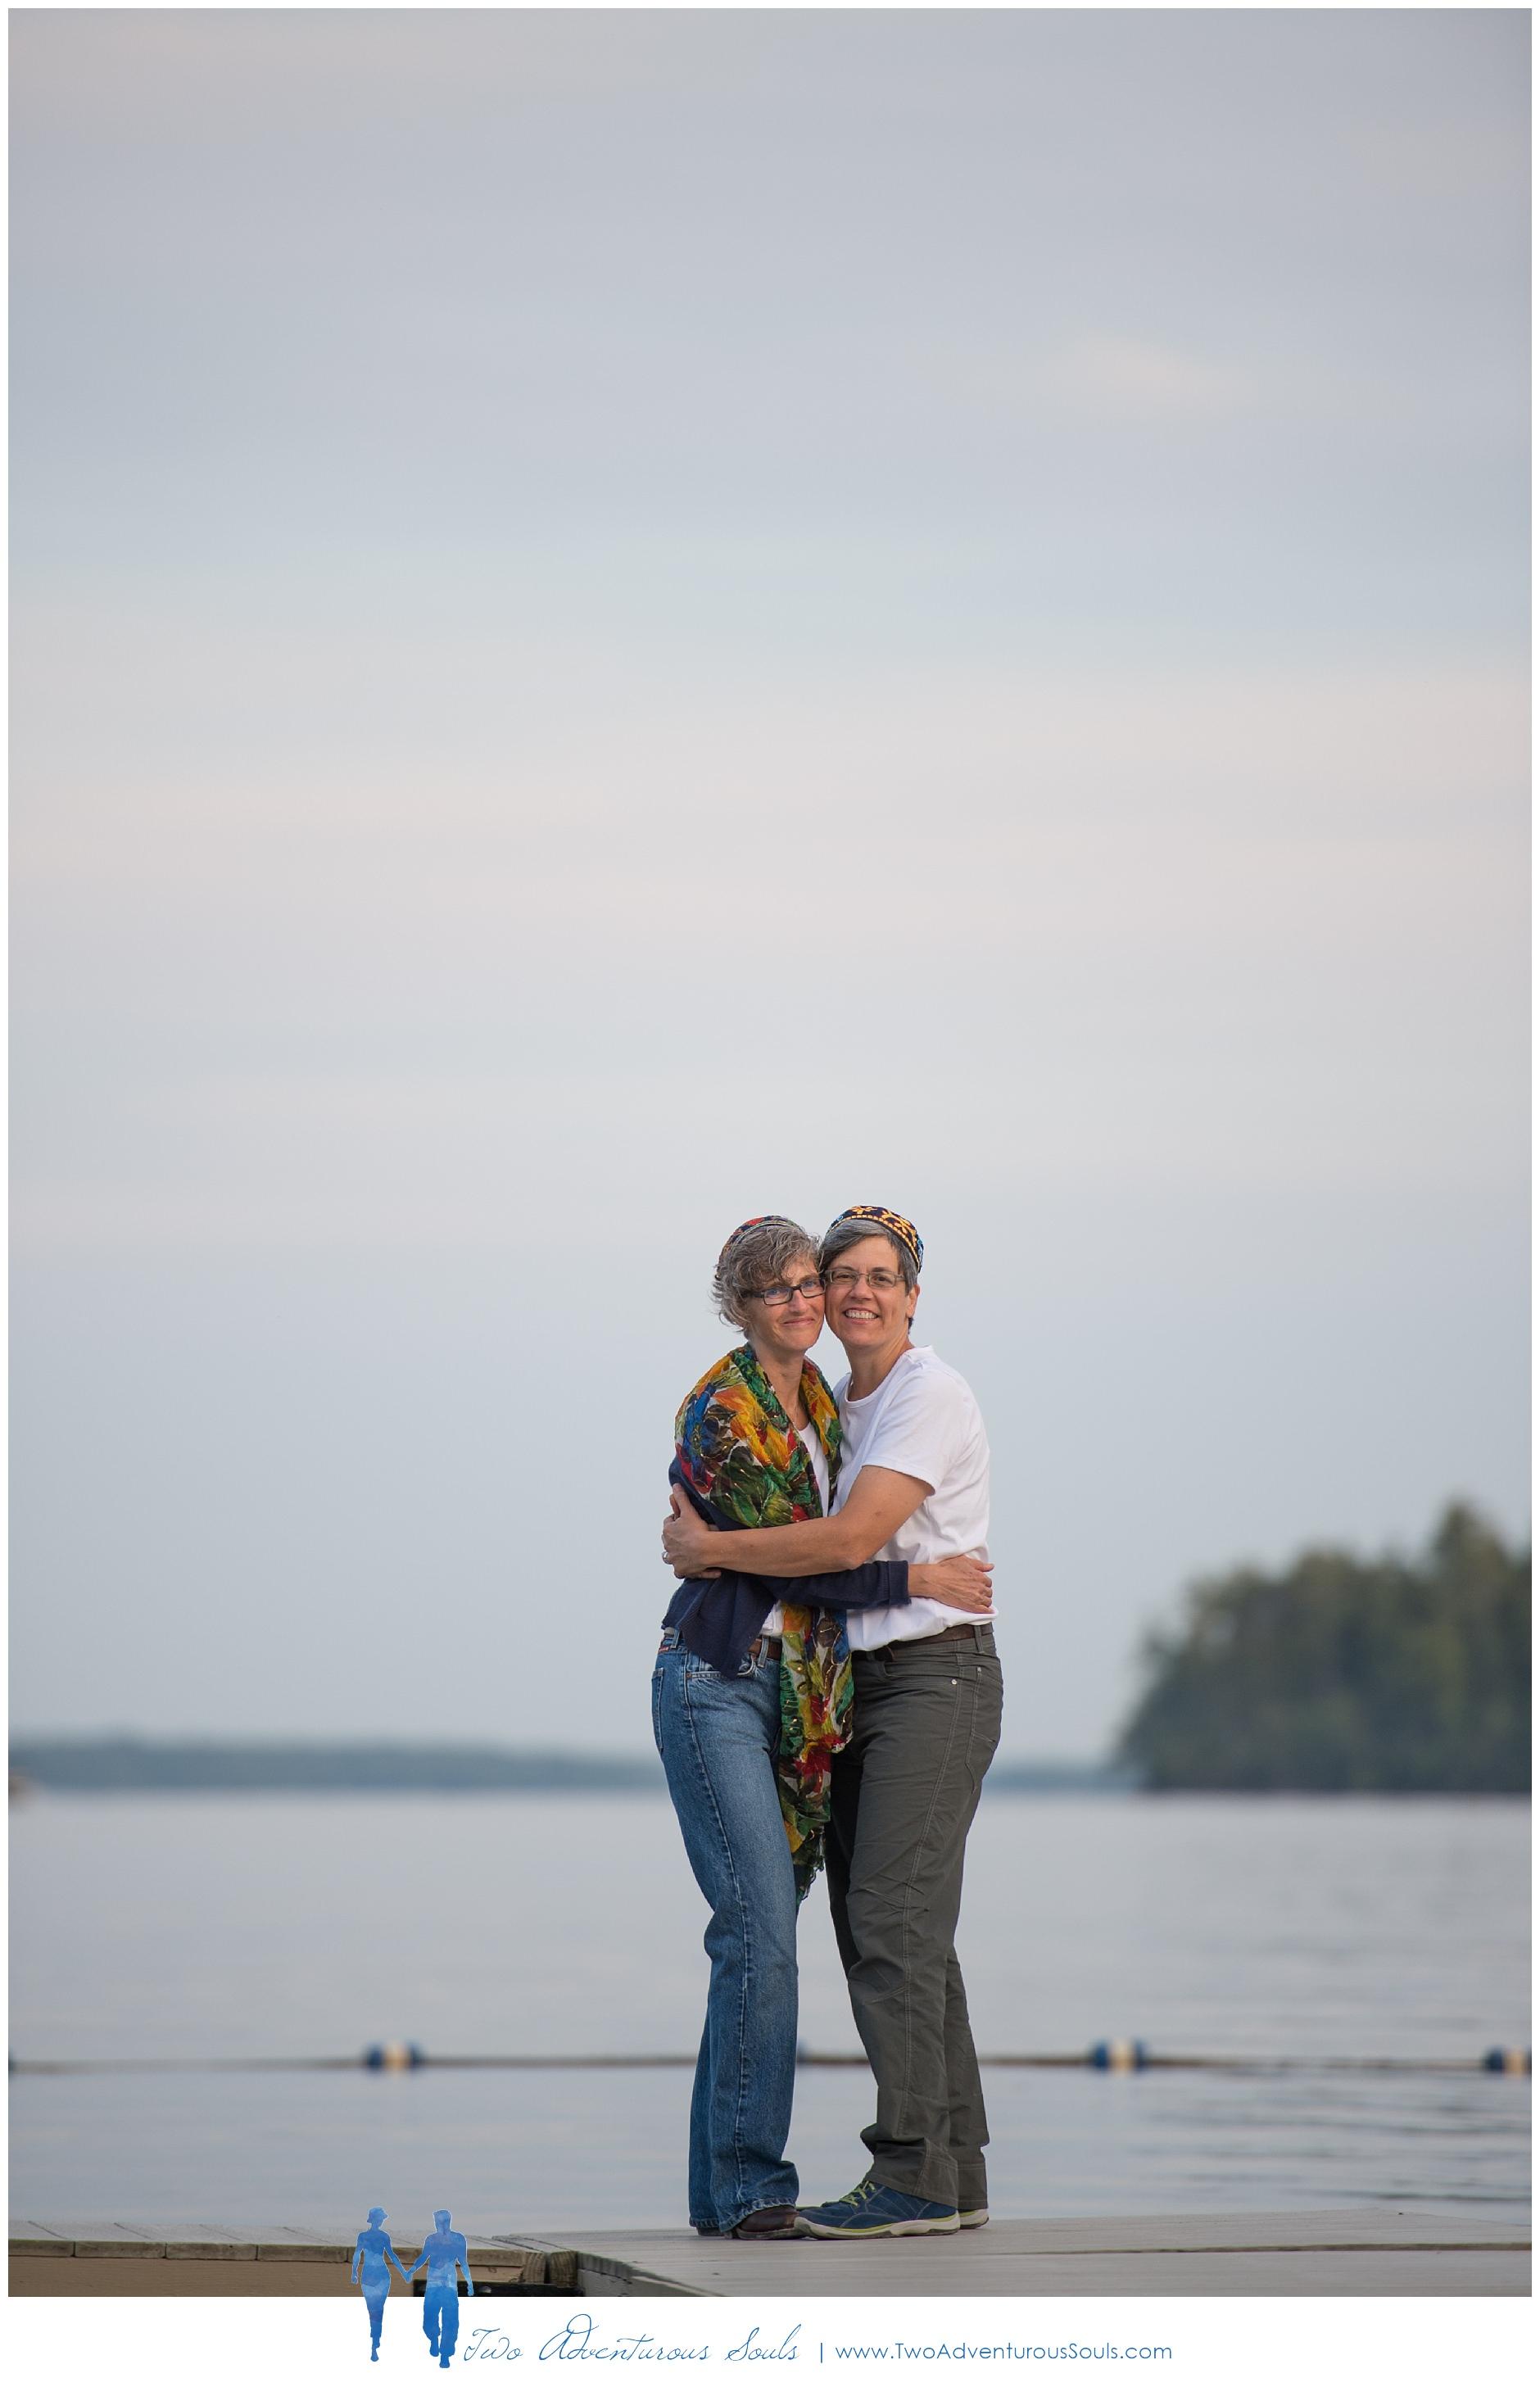 090217-Mindy-Karen-sneaks-80_WEB-Maine-Wedding-and-Portrait-Photographer.jpg